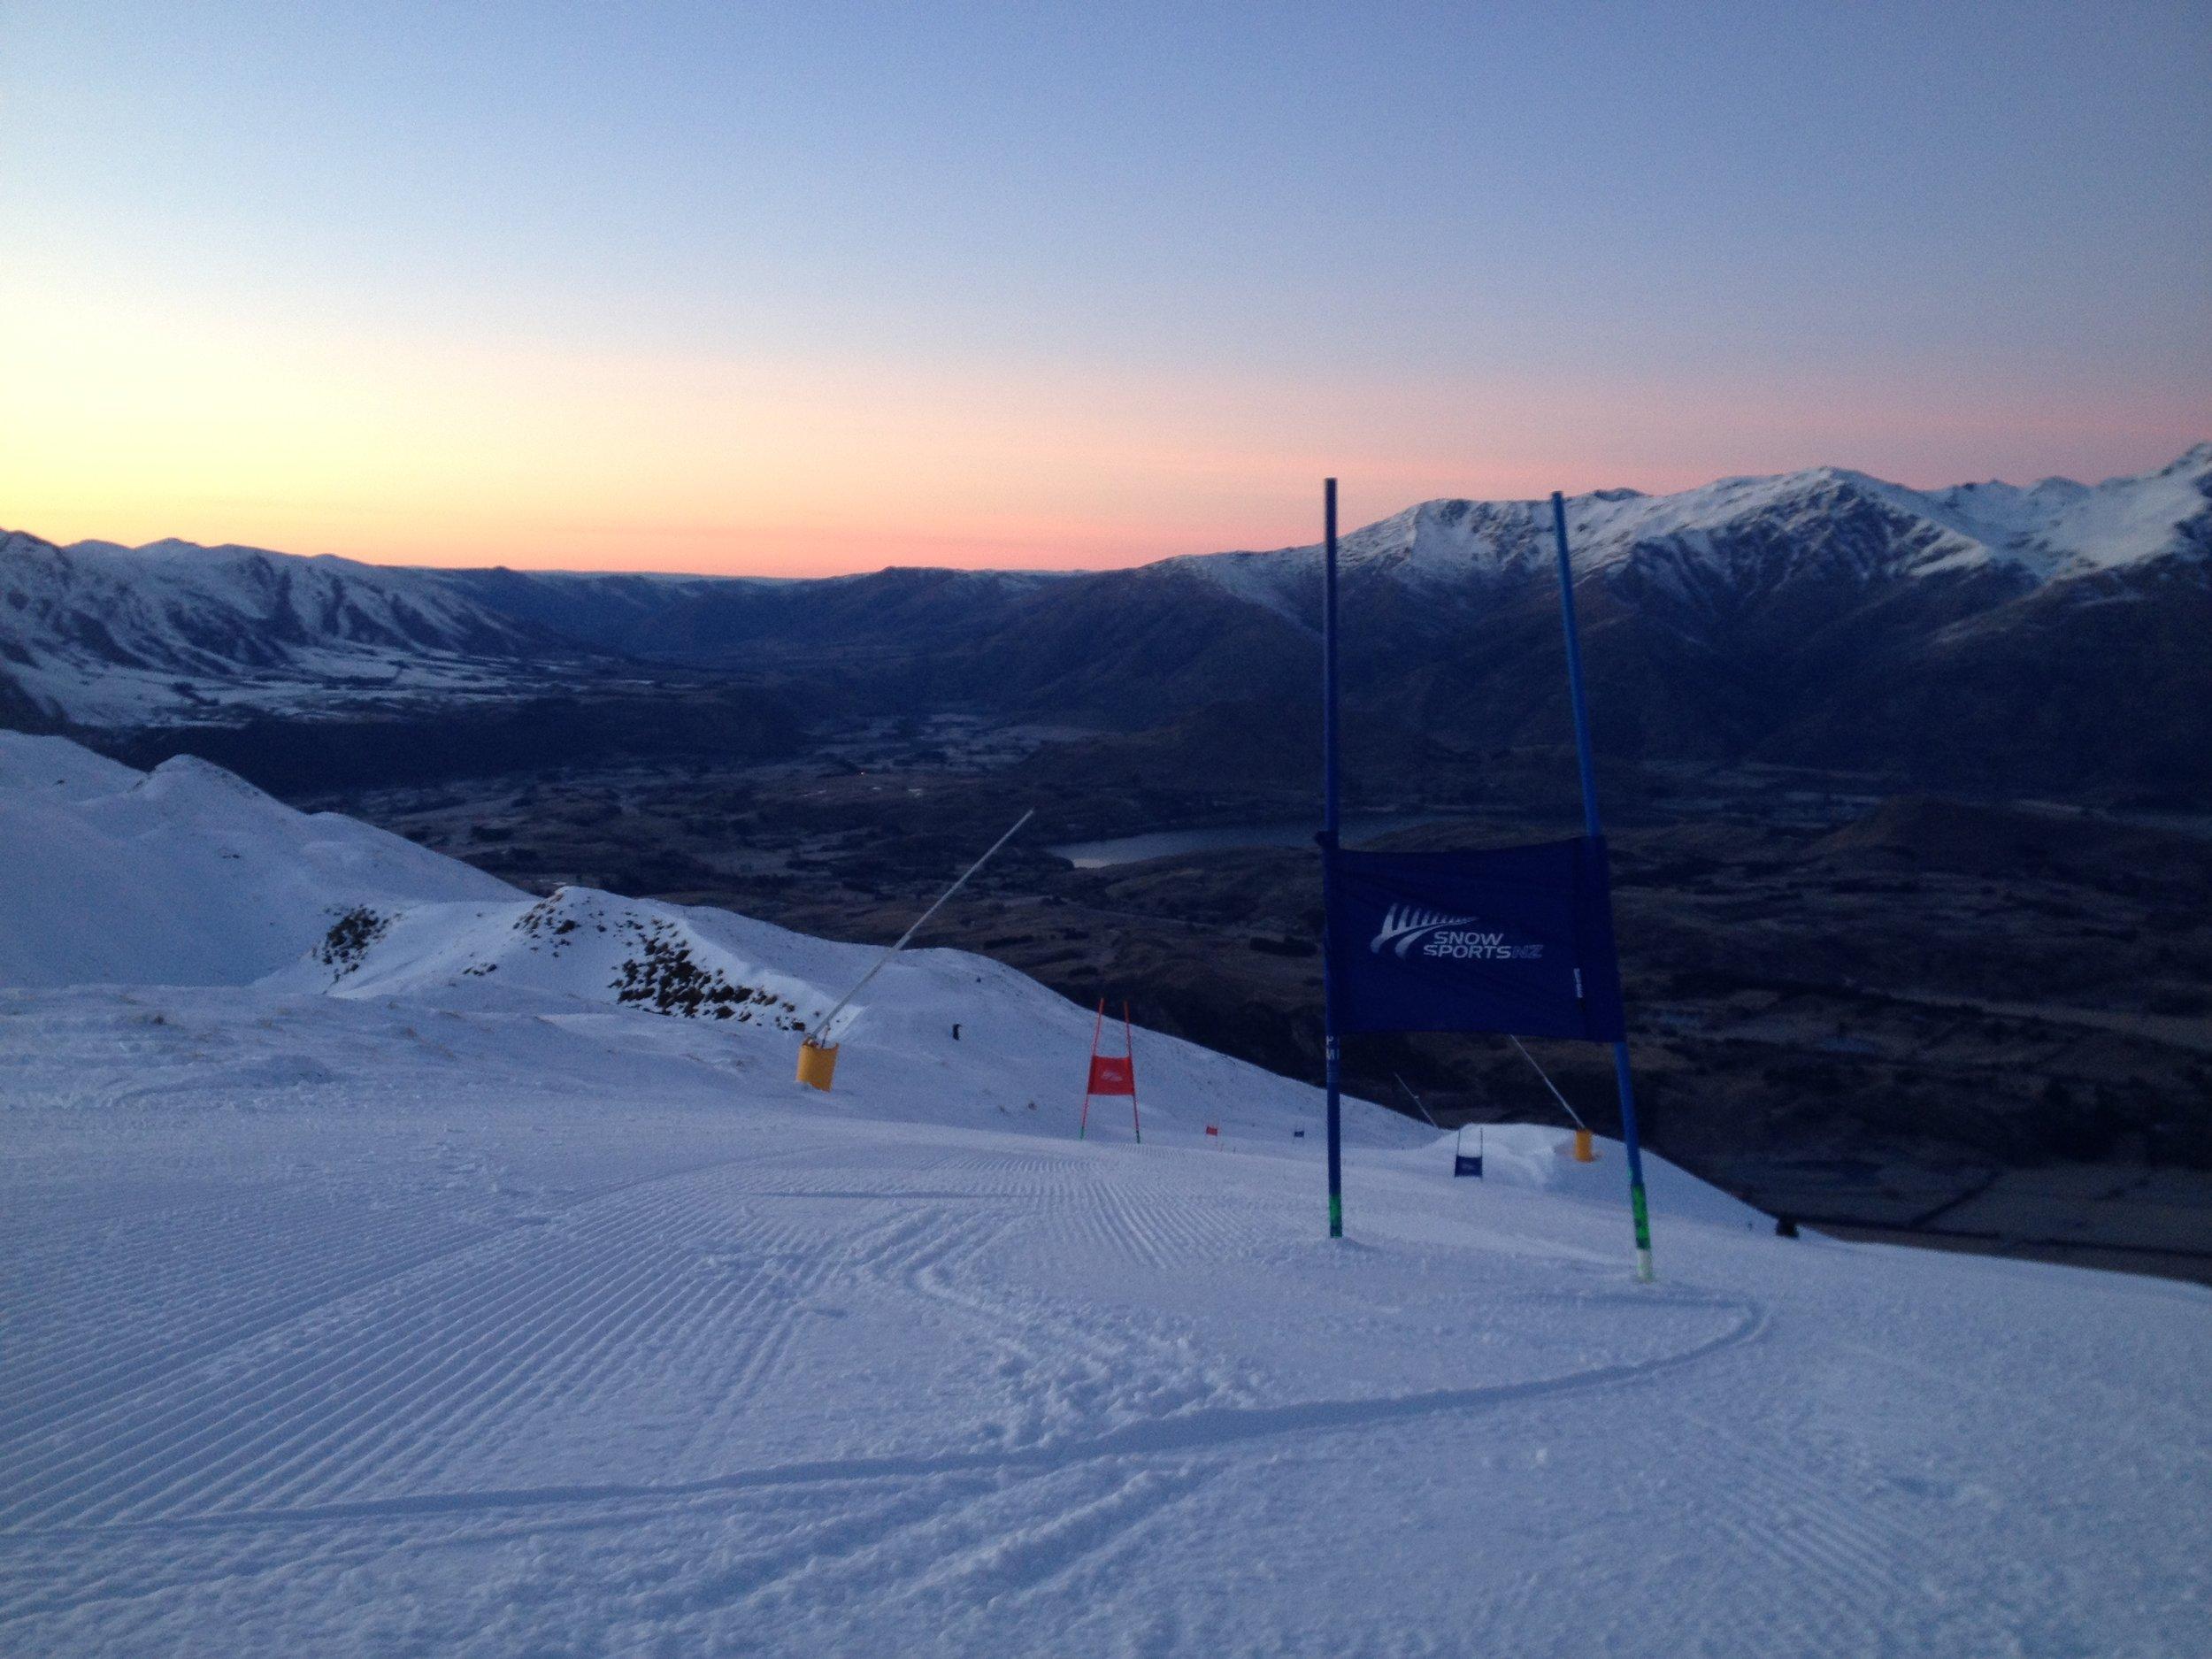 Early GS training at Coronet Peak